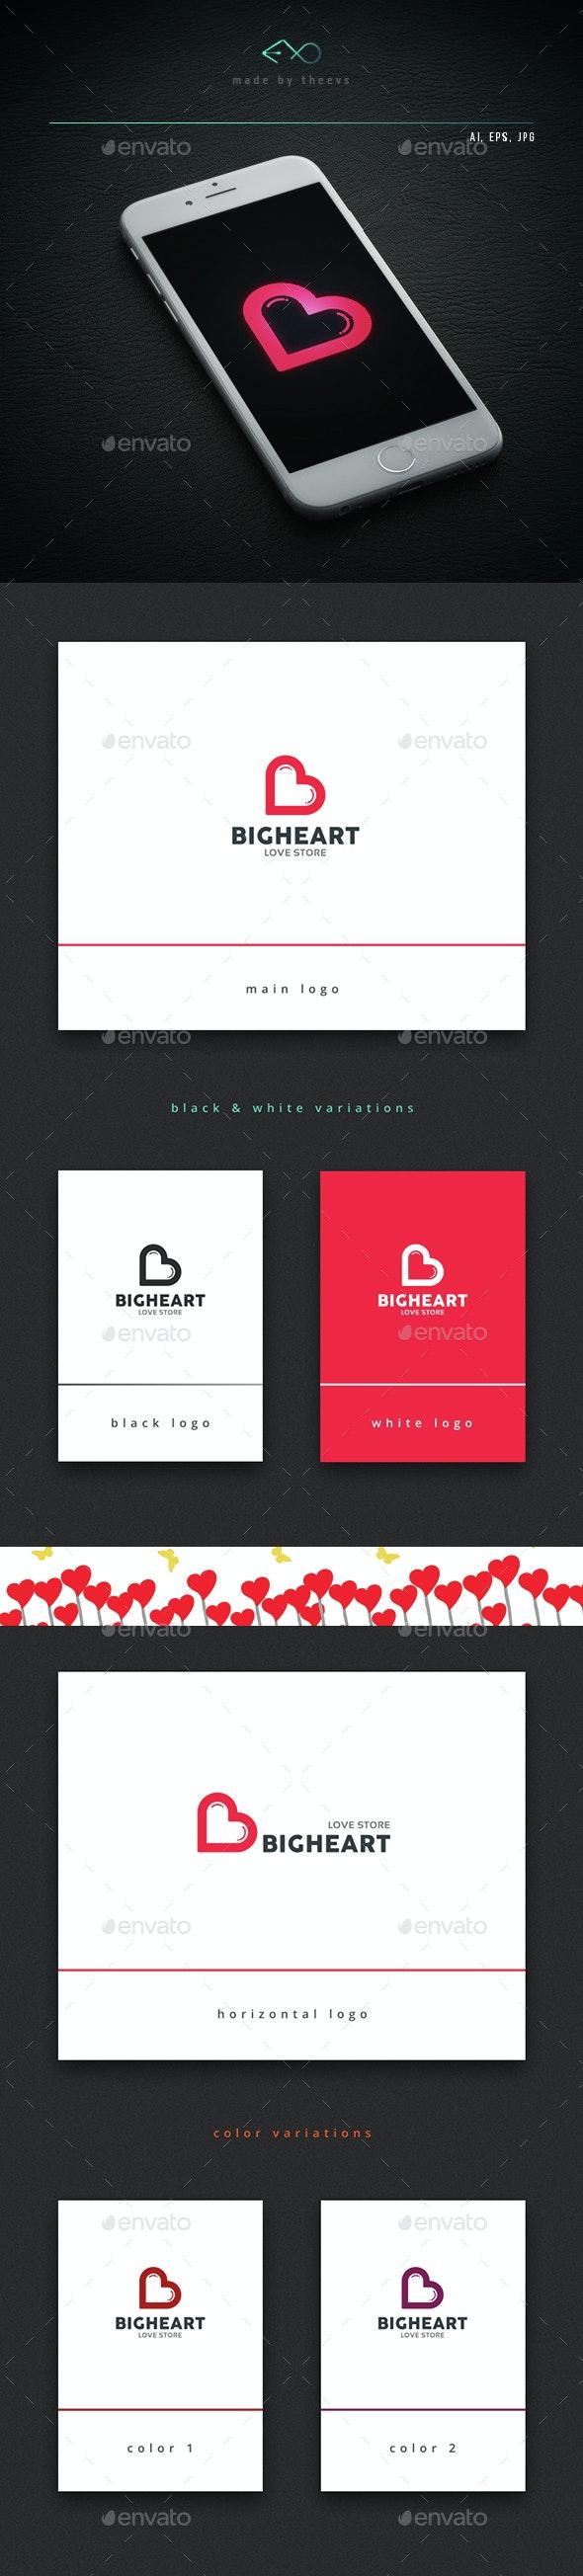 Bigheart - Letters Logo Templates